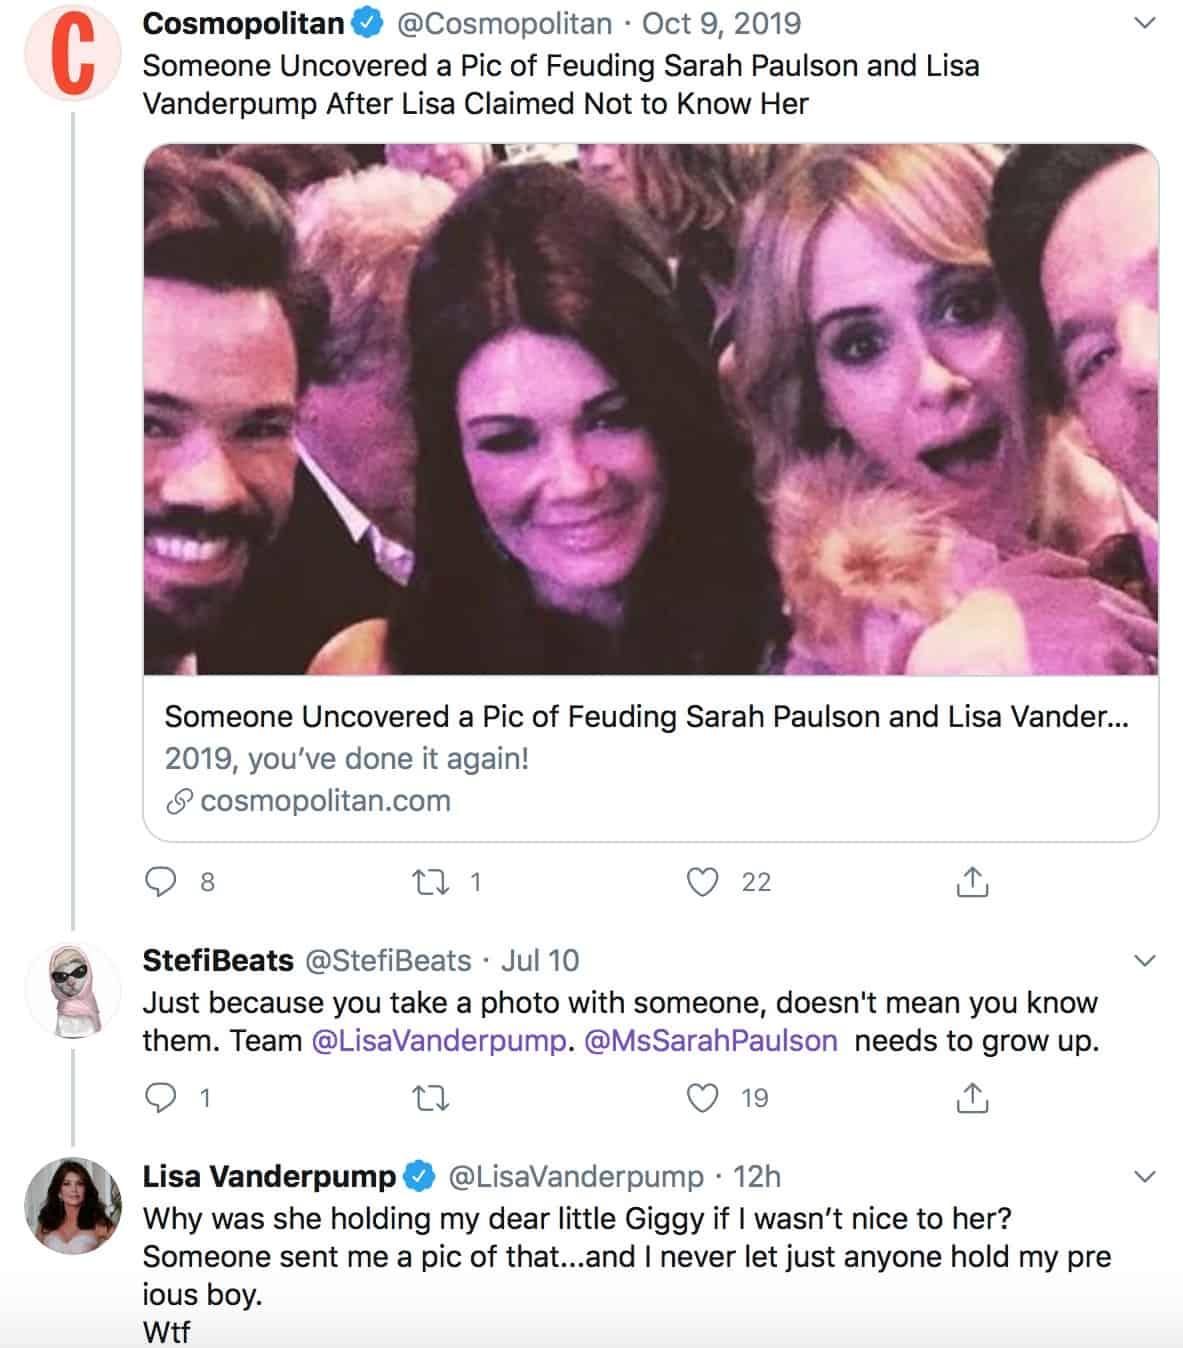 RHOBH Lisa Vanderpump Says She Doesn't Let Just Anyone Hold Giggy Amid Sarah Paulson Feud